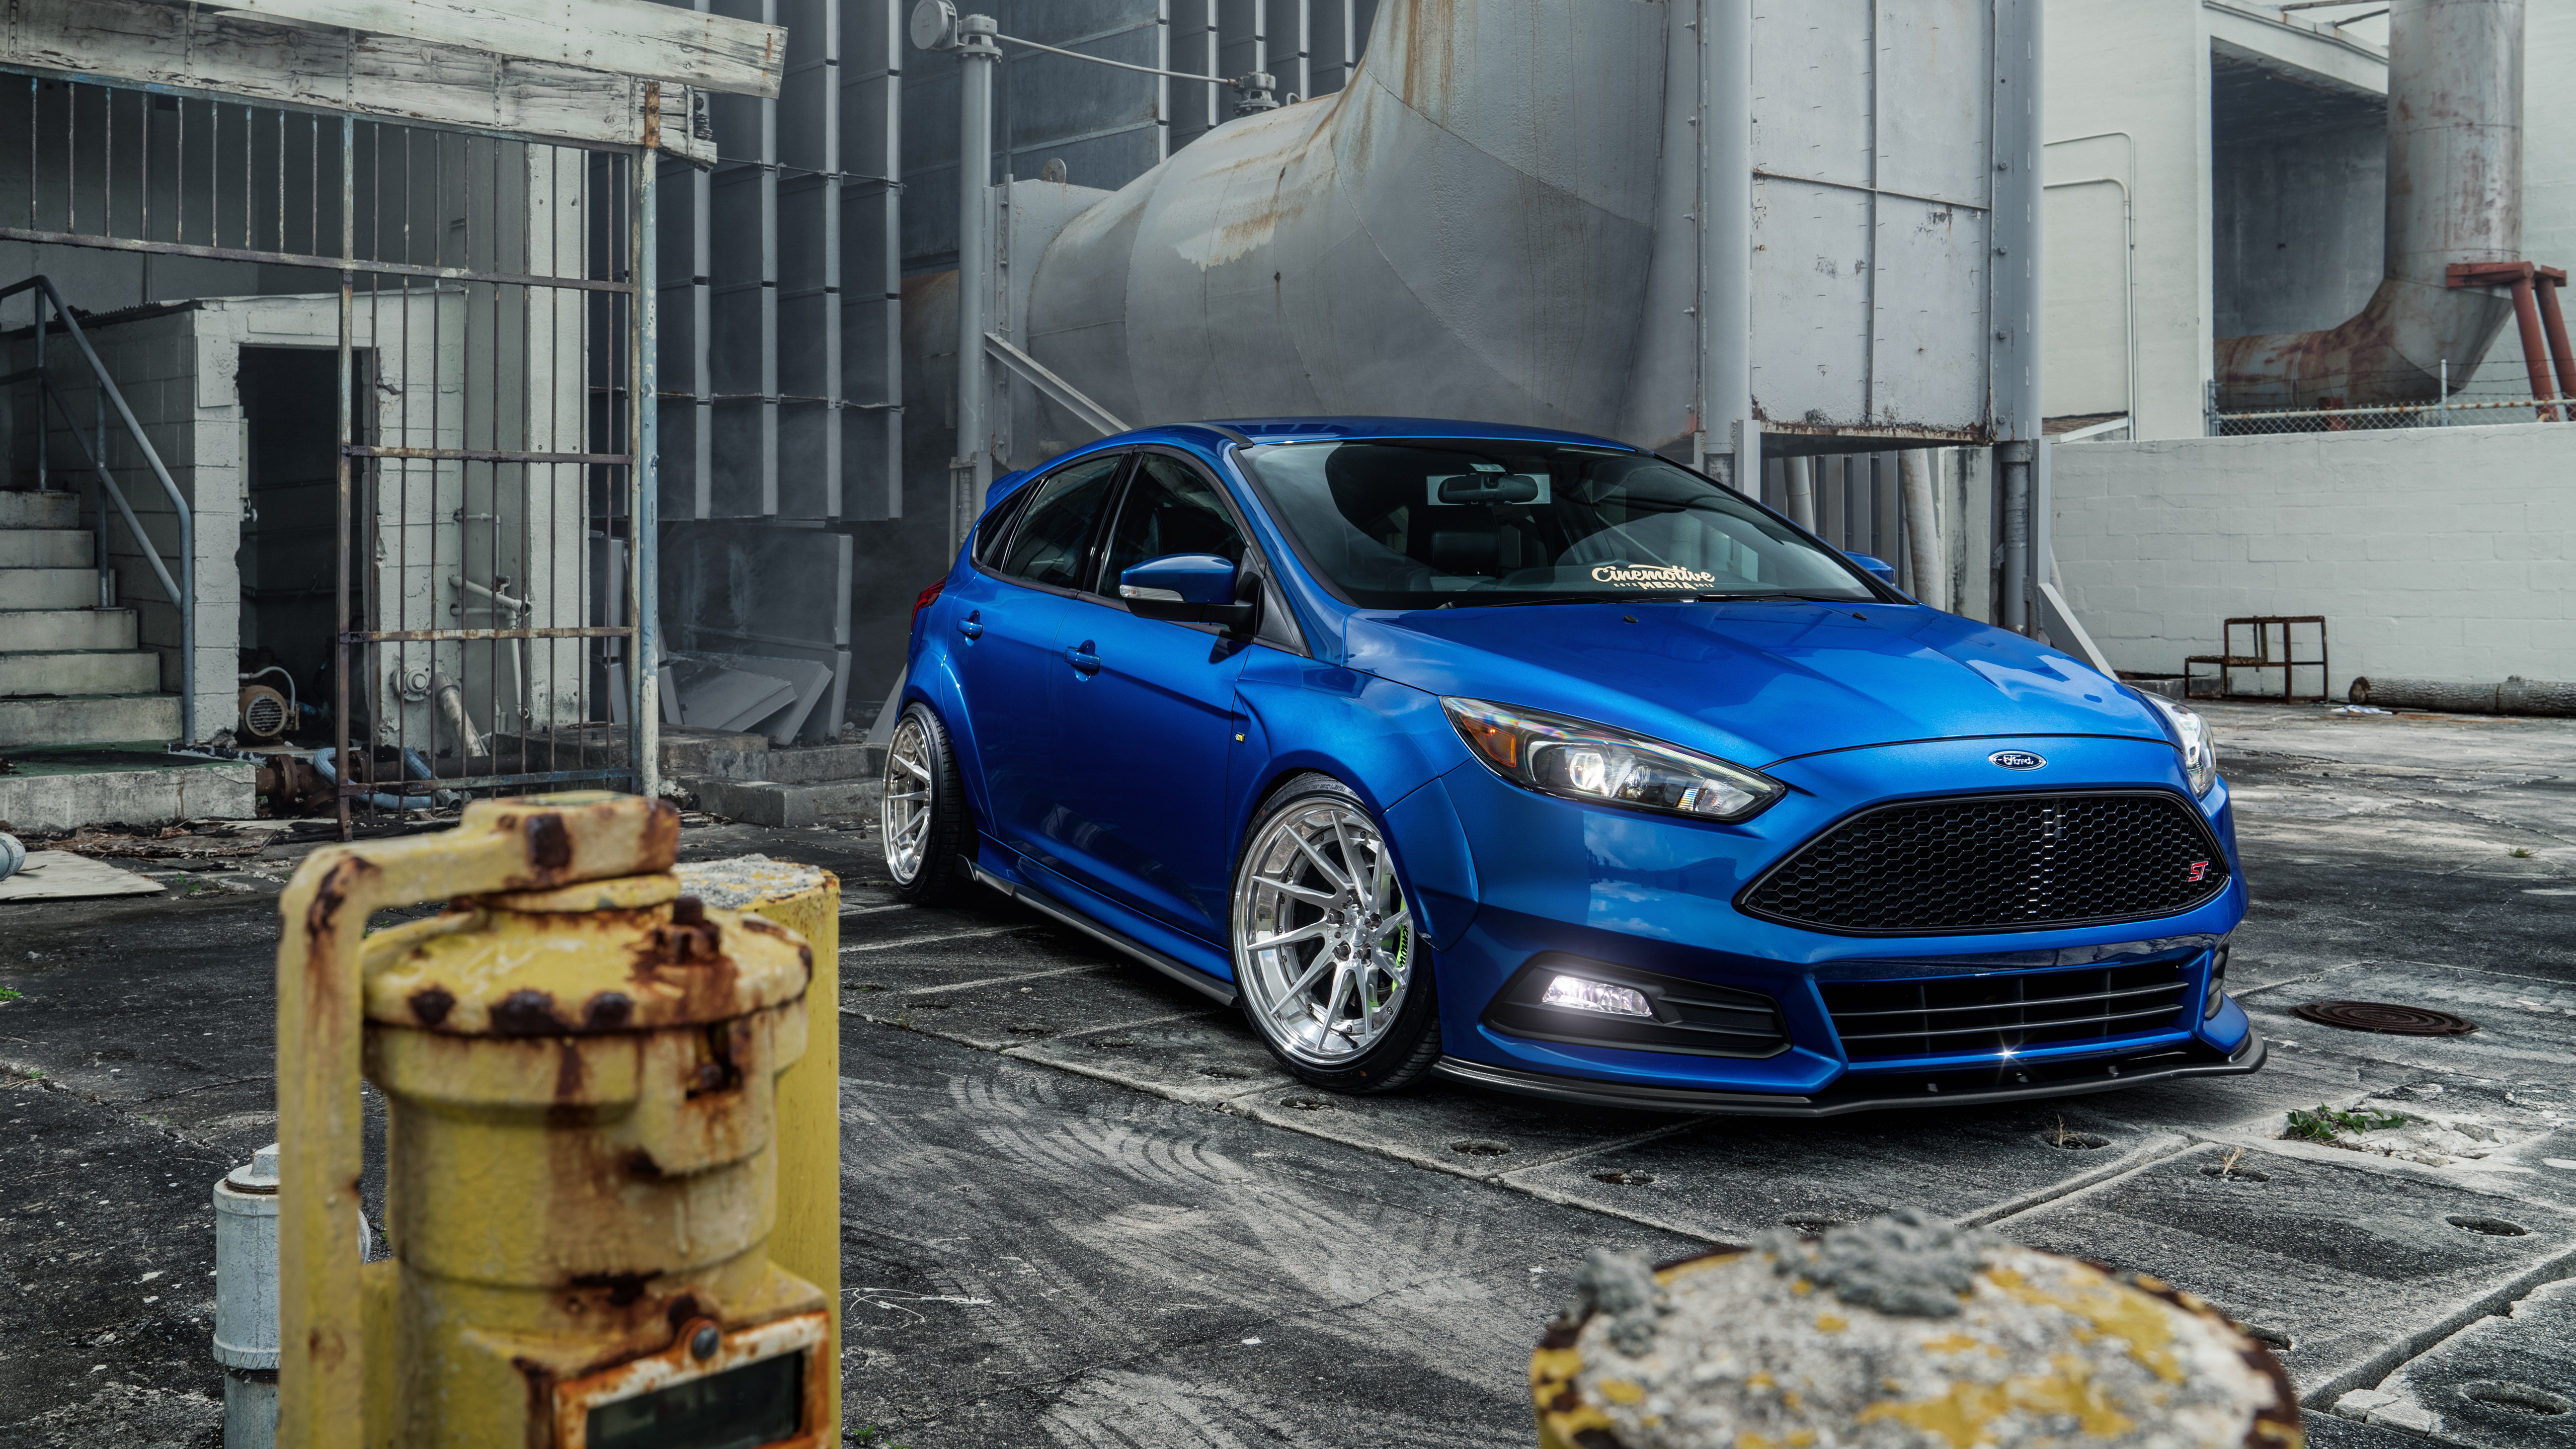 Cinemotive Ford Focus St 5k Wallpaper Hd Car Wallpapers